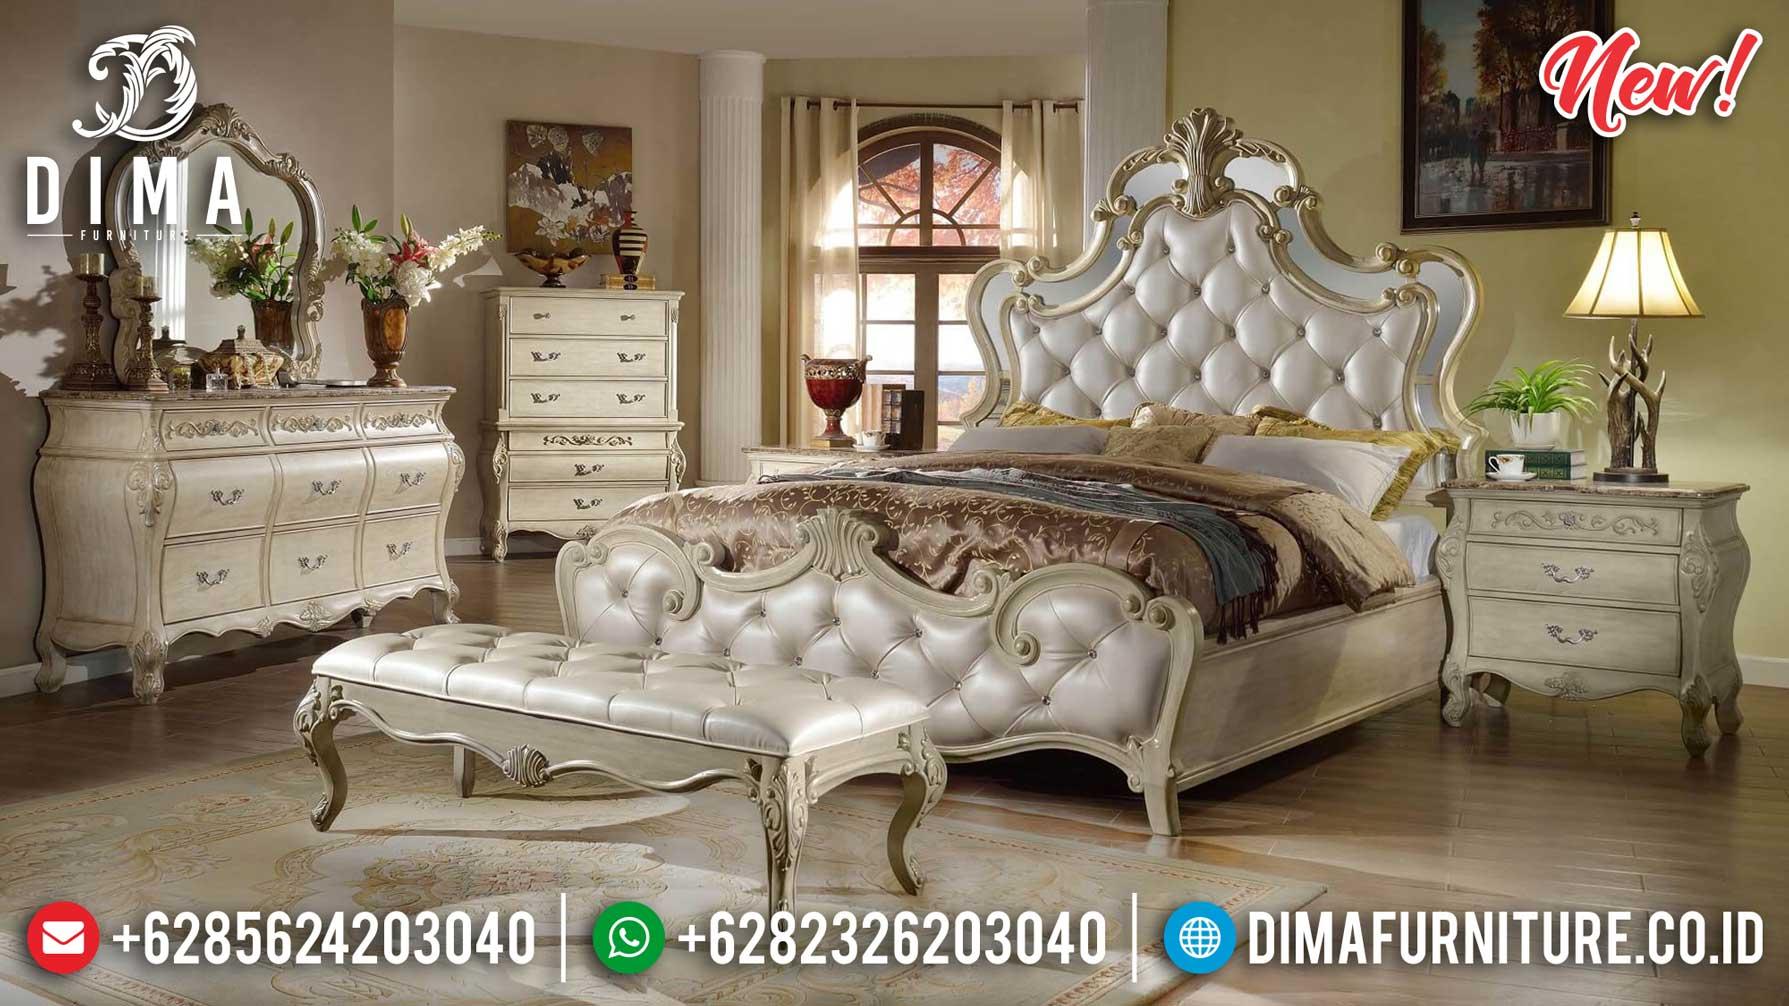 New Model Tempat Tidur Mewah Classic Luxury Art Deco Beauty Carving Design ST-1068